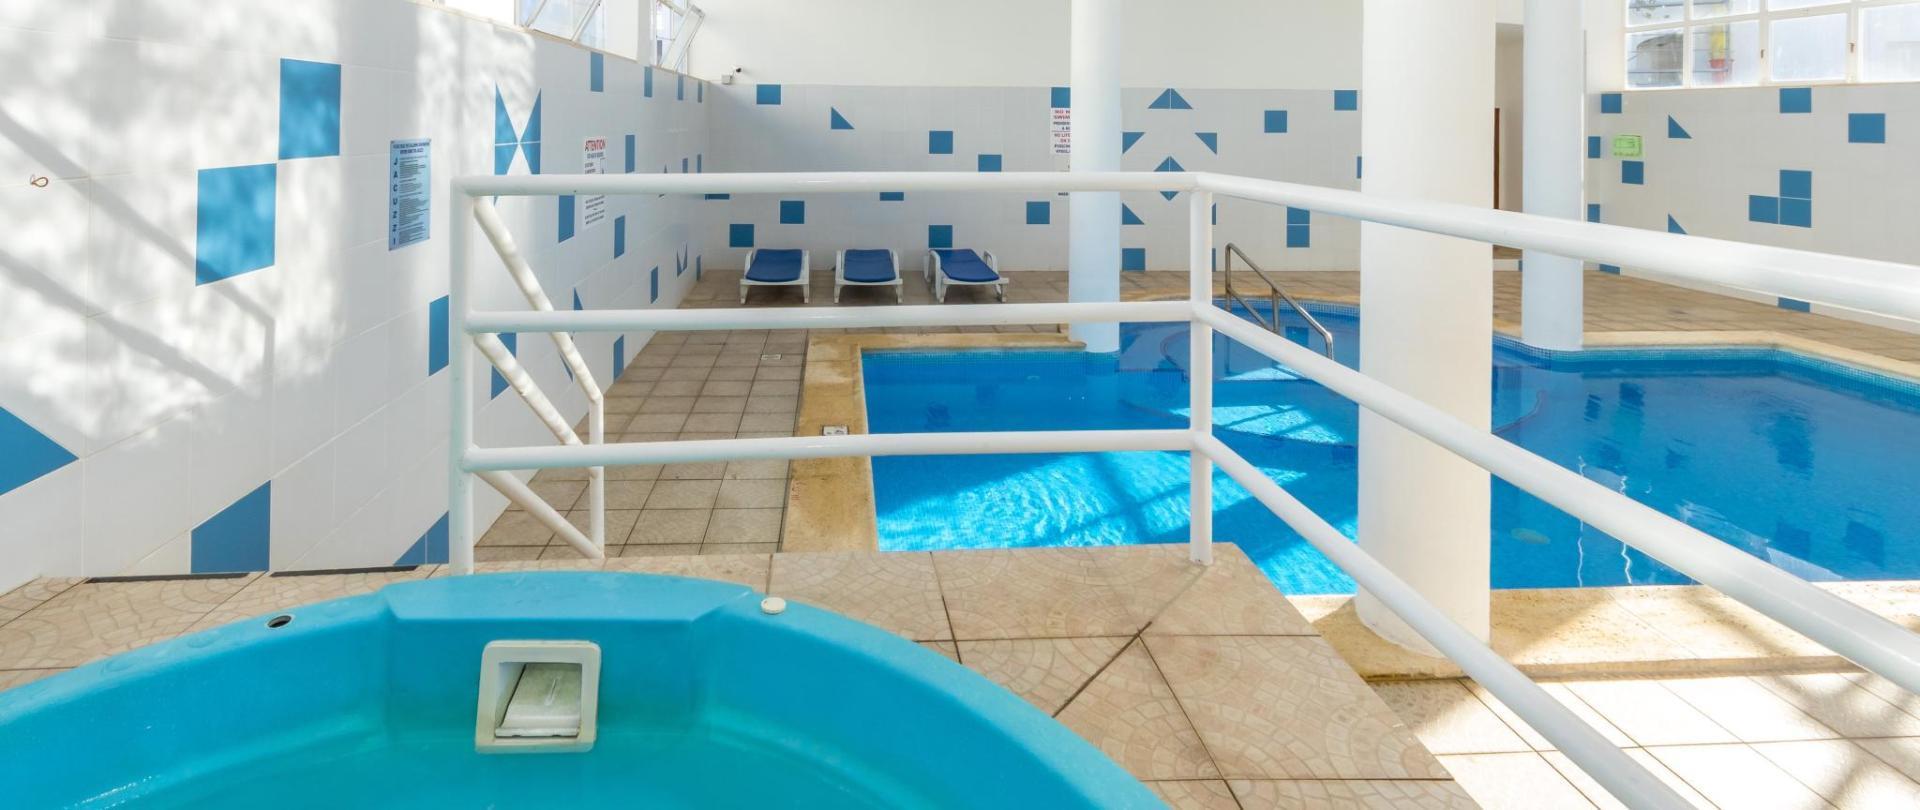 Ouratlantico - Piscina interior-4.jpg